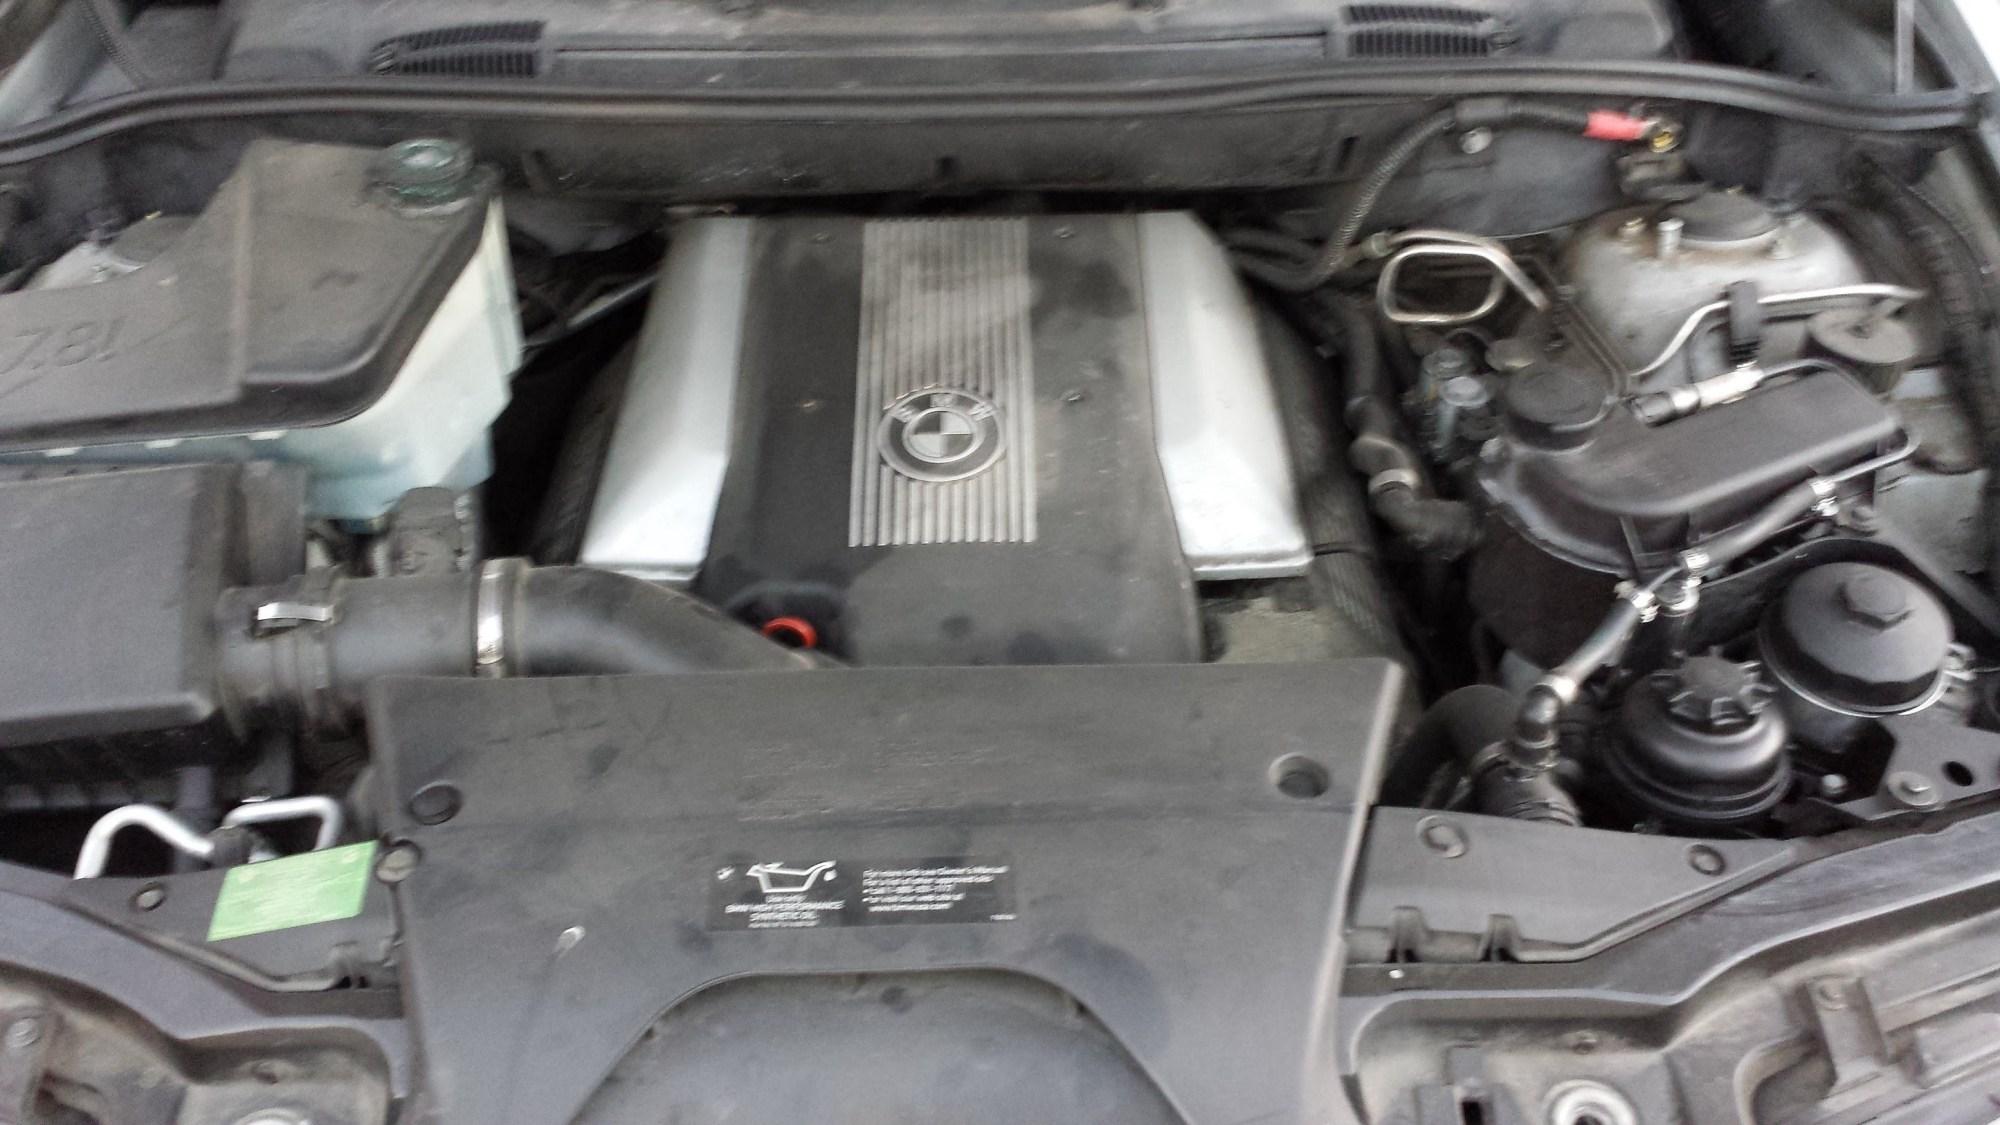 hight resolution of bmw 318ti engine diagram bmw e53 x5 4 4 vanos engine diagram of bmw 318ti engine